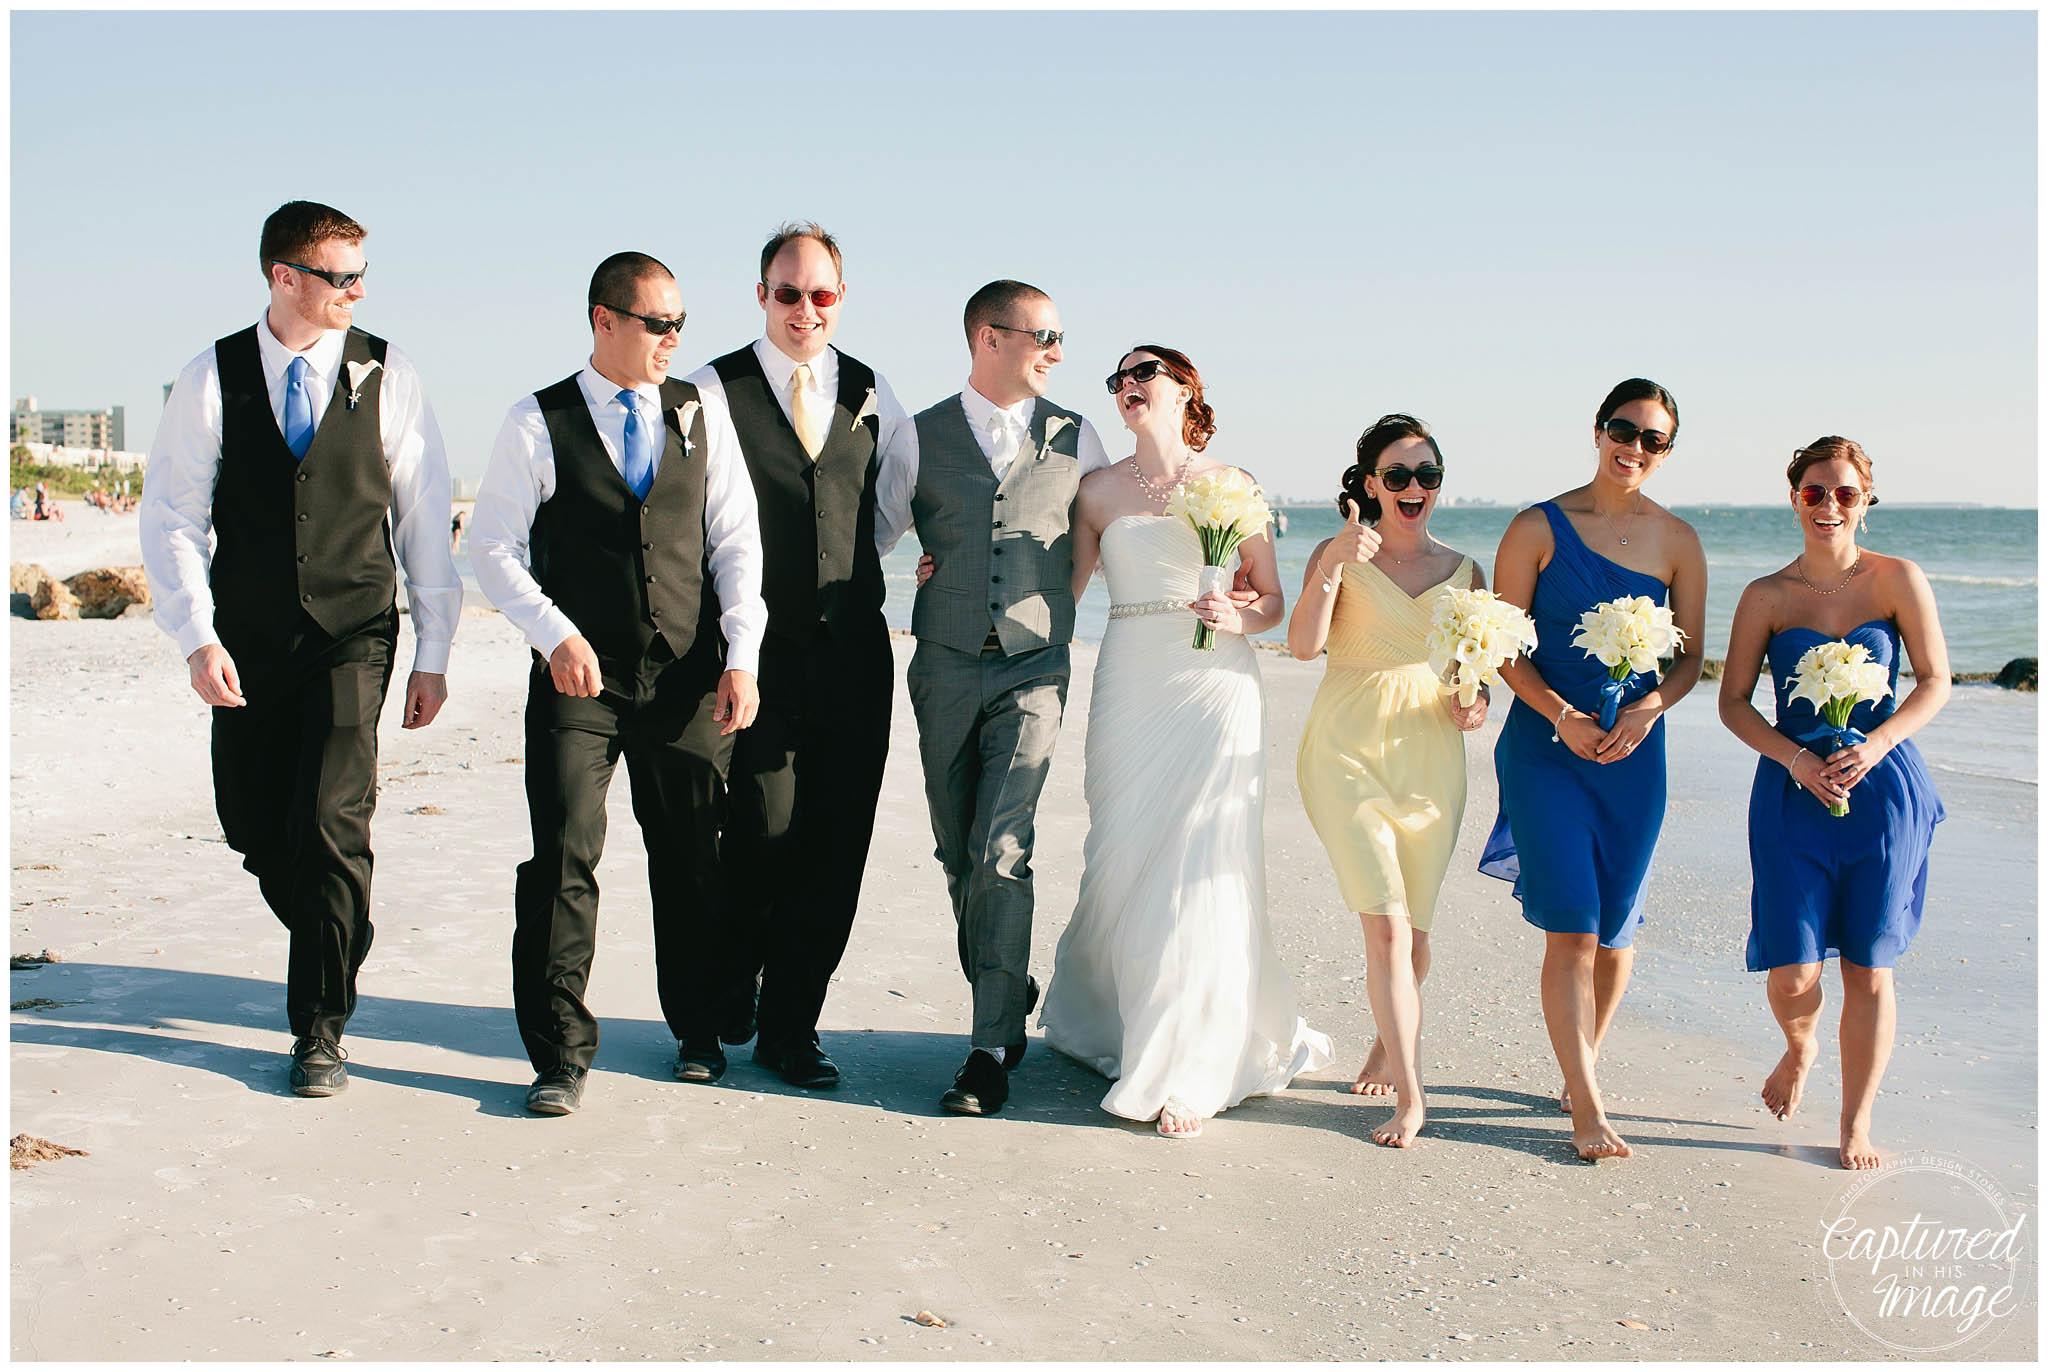 St. Pete Beach Destination Wedding (14 of 81)